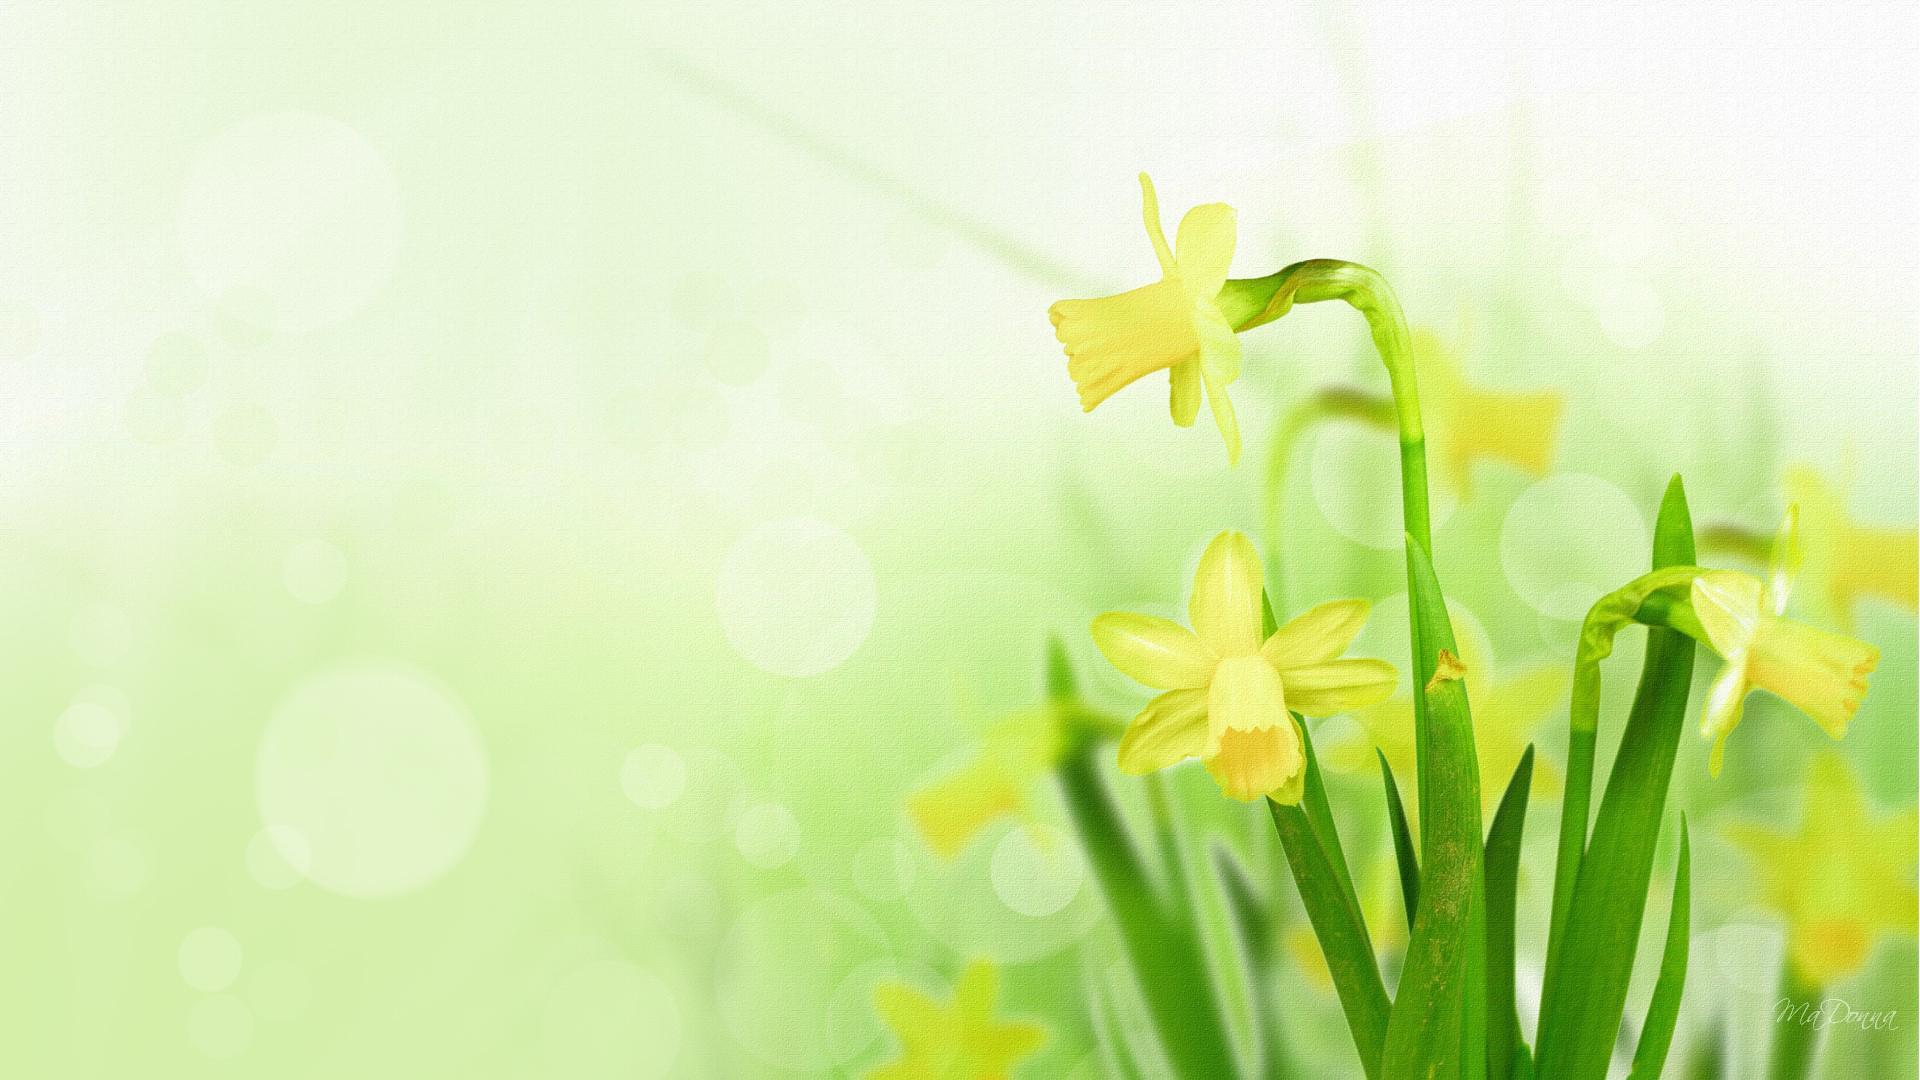 download daffodils 1920x1080 wallpaper - photo #20